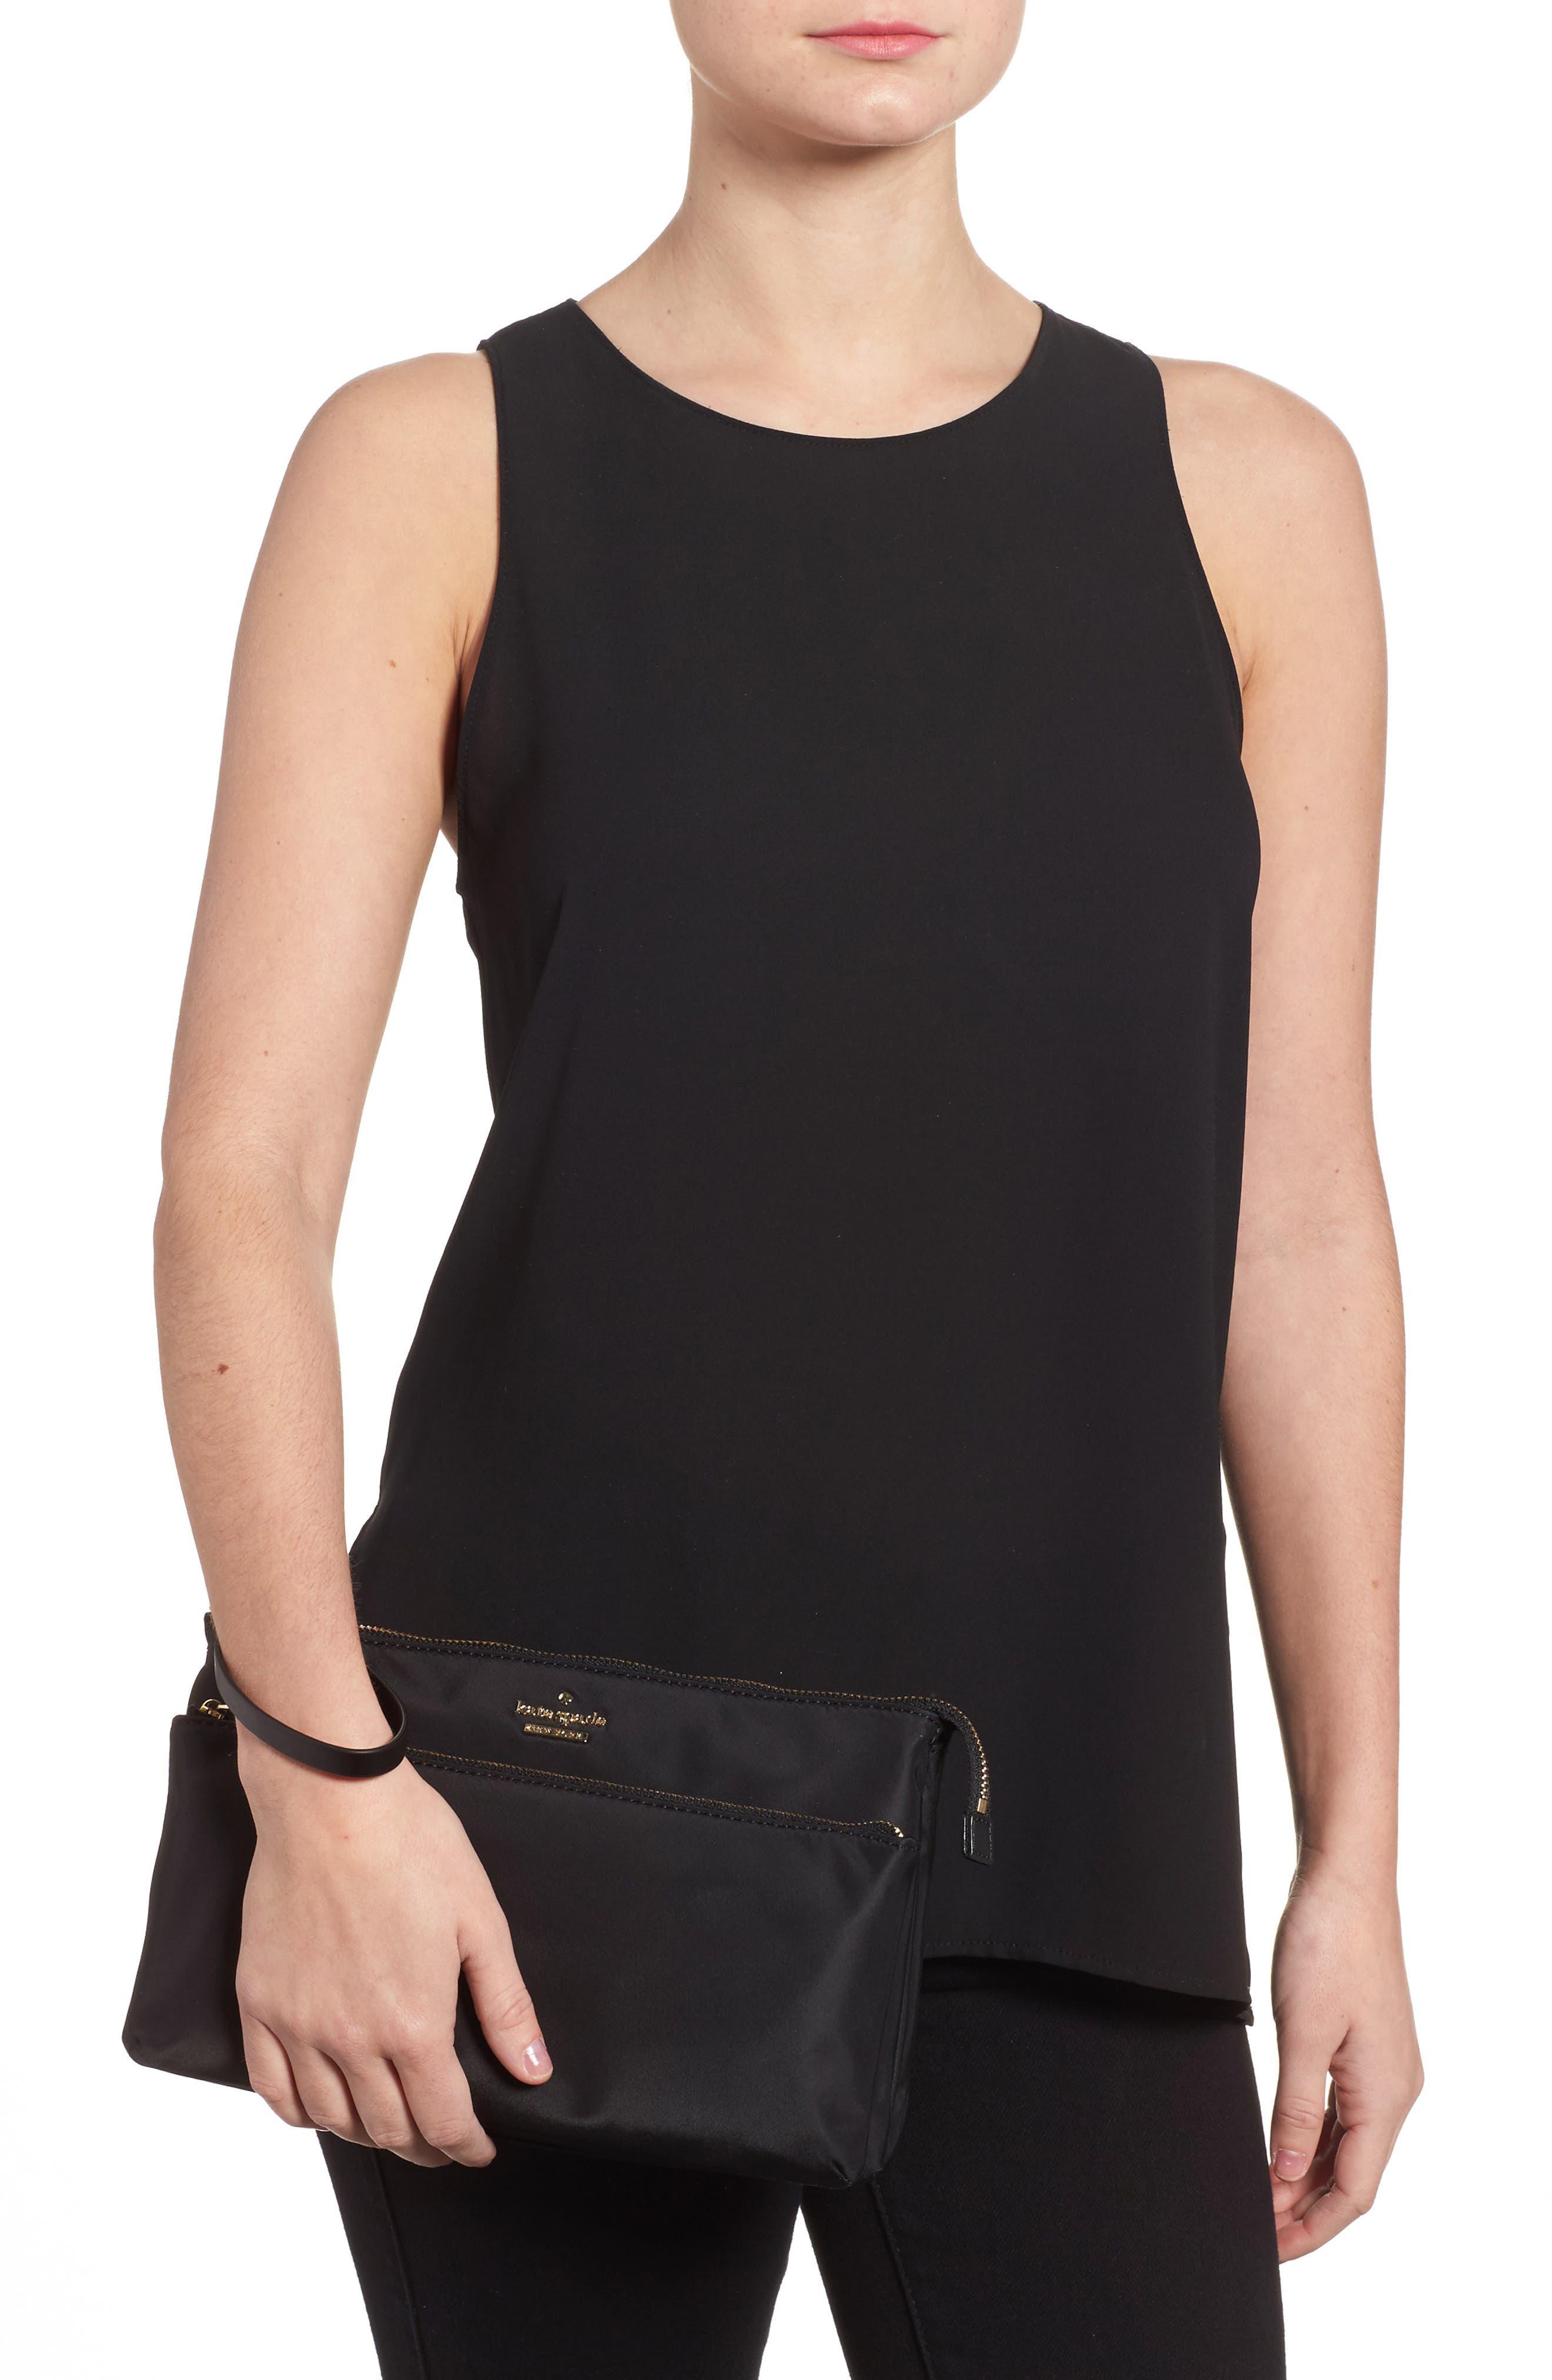 watson lane winnie baby nylon pouch with changing mat,                             Alternate thumbnail 2, color,                             Black